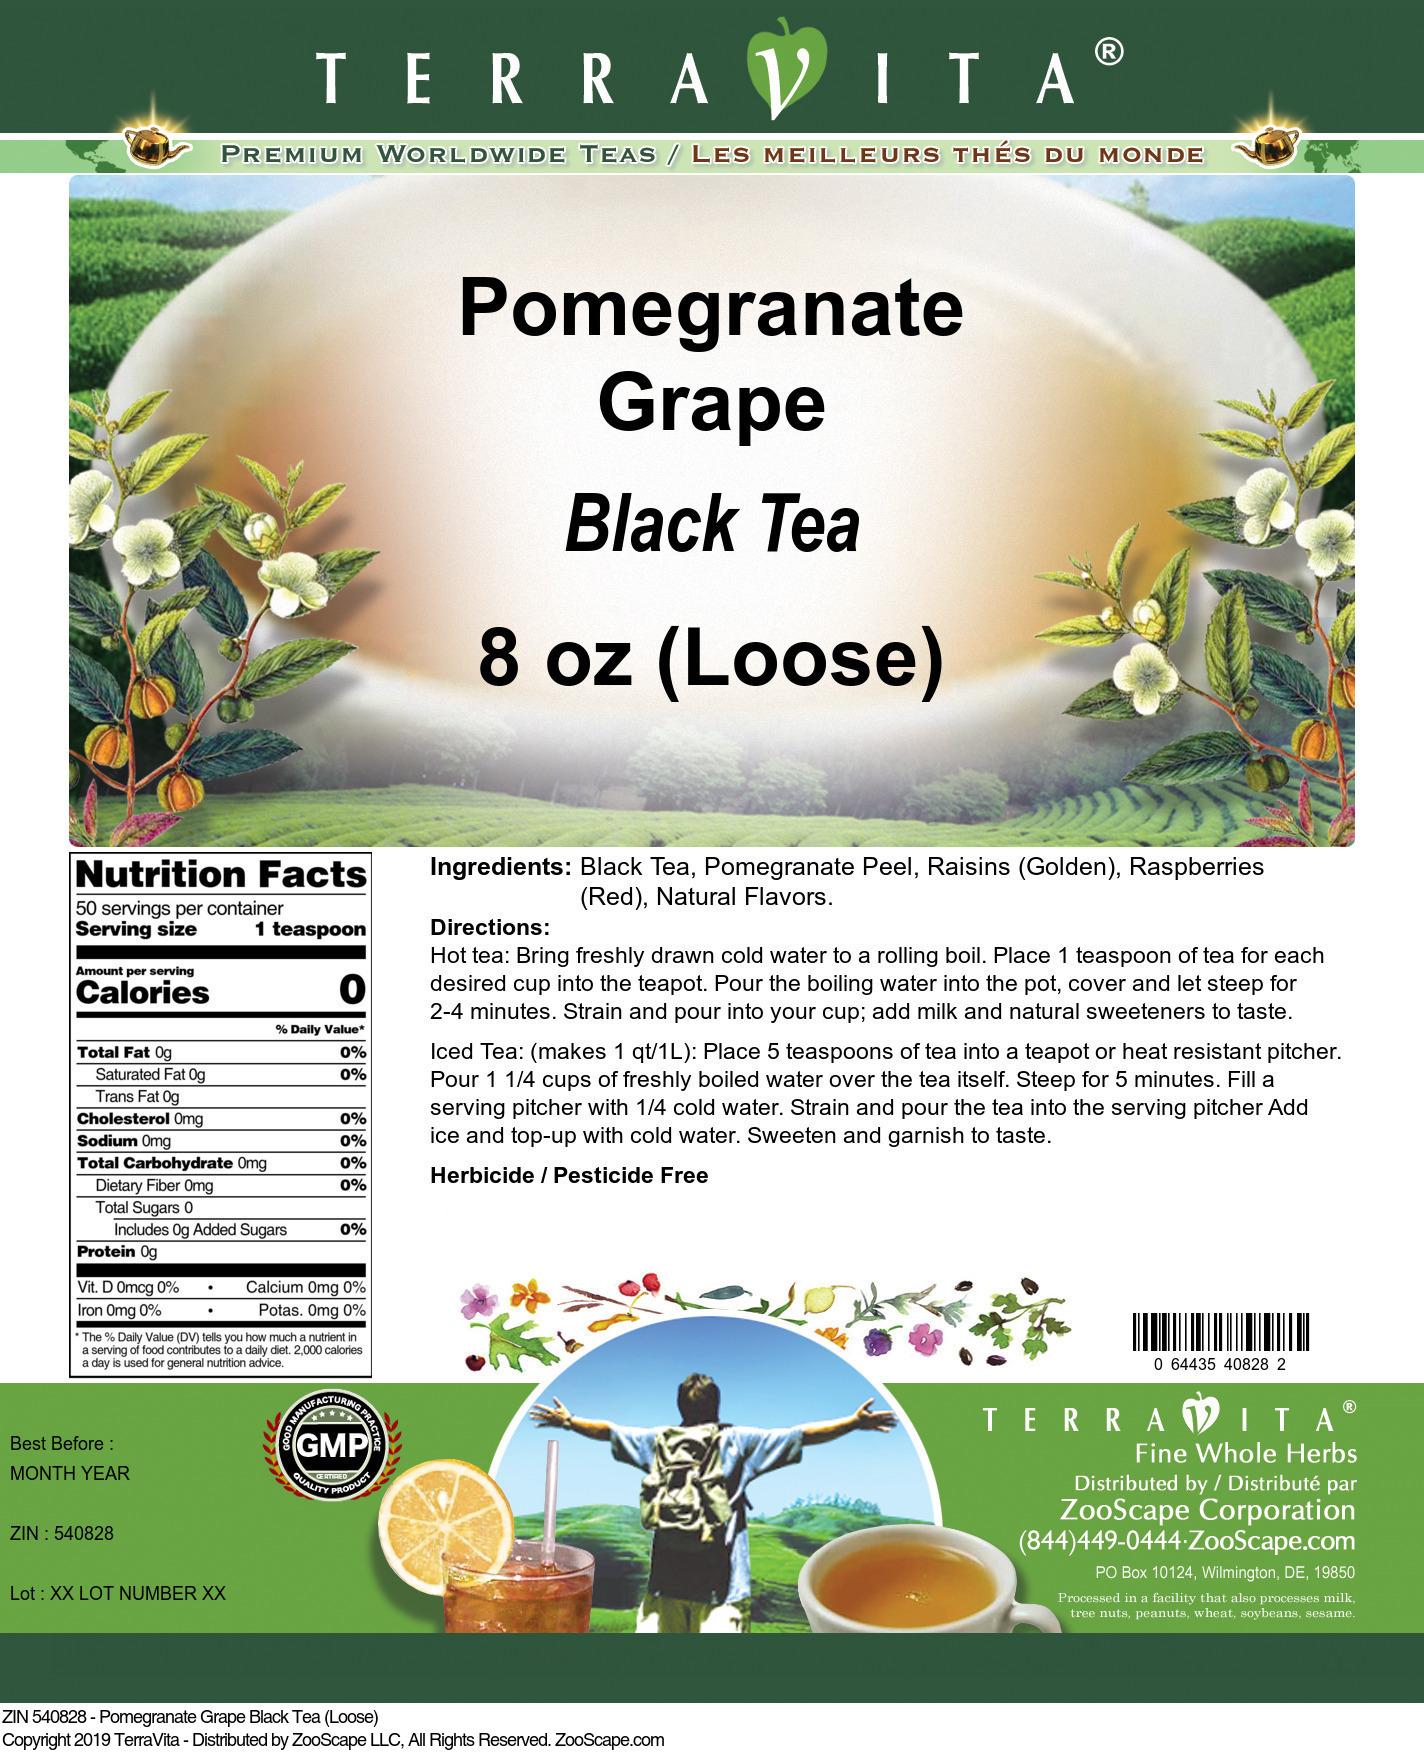 Pomegranate Grape Black Tea